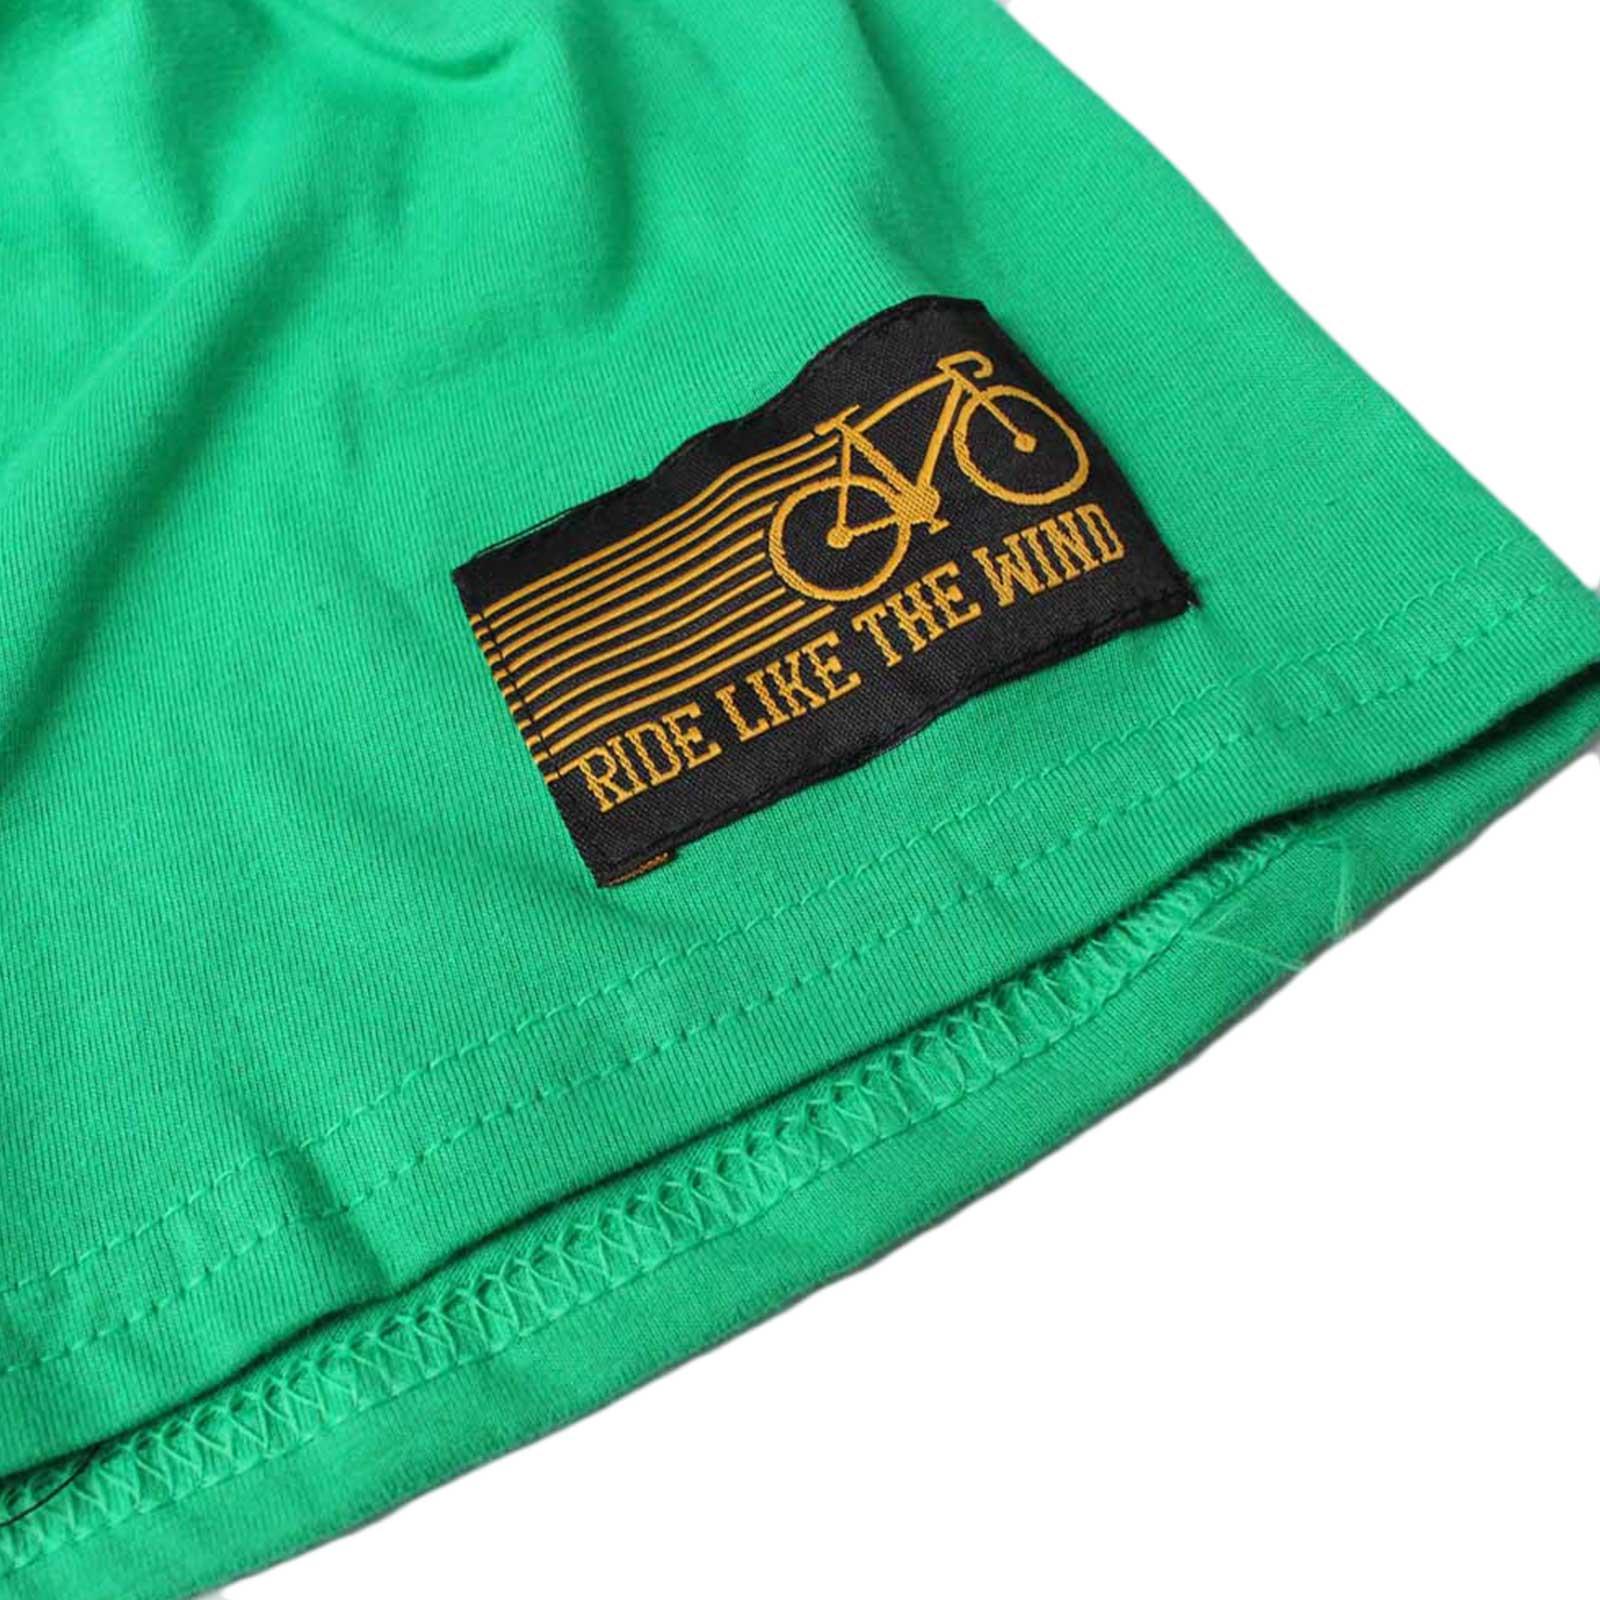 Cycling-T-Shirt-Funny-Novelty-Mens-tee-TShirt-Bike-Part-Words thumbnail 12